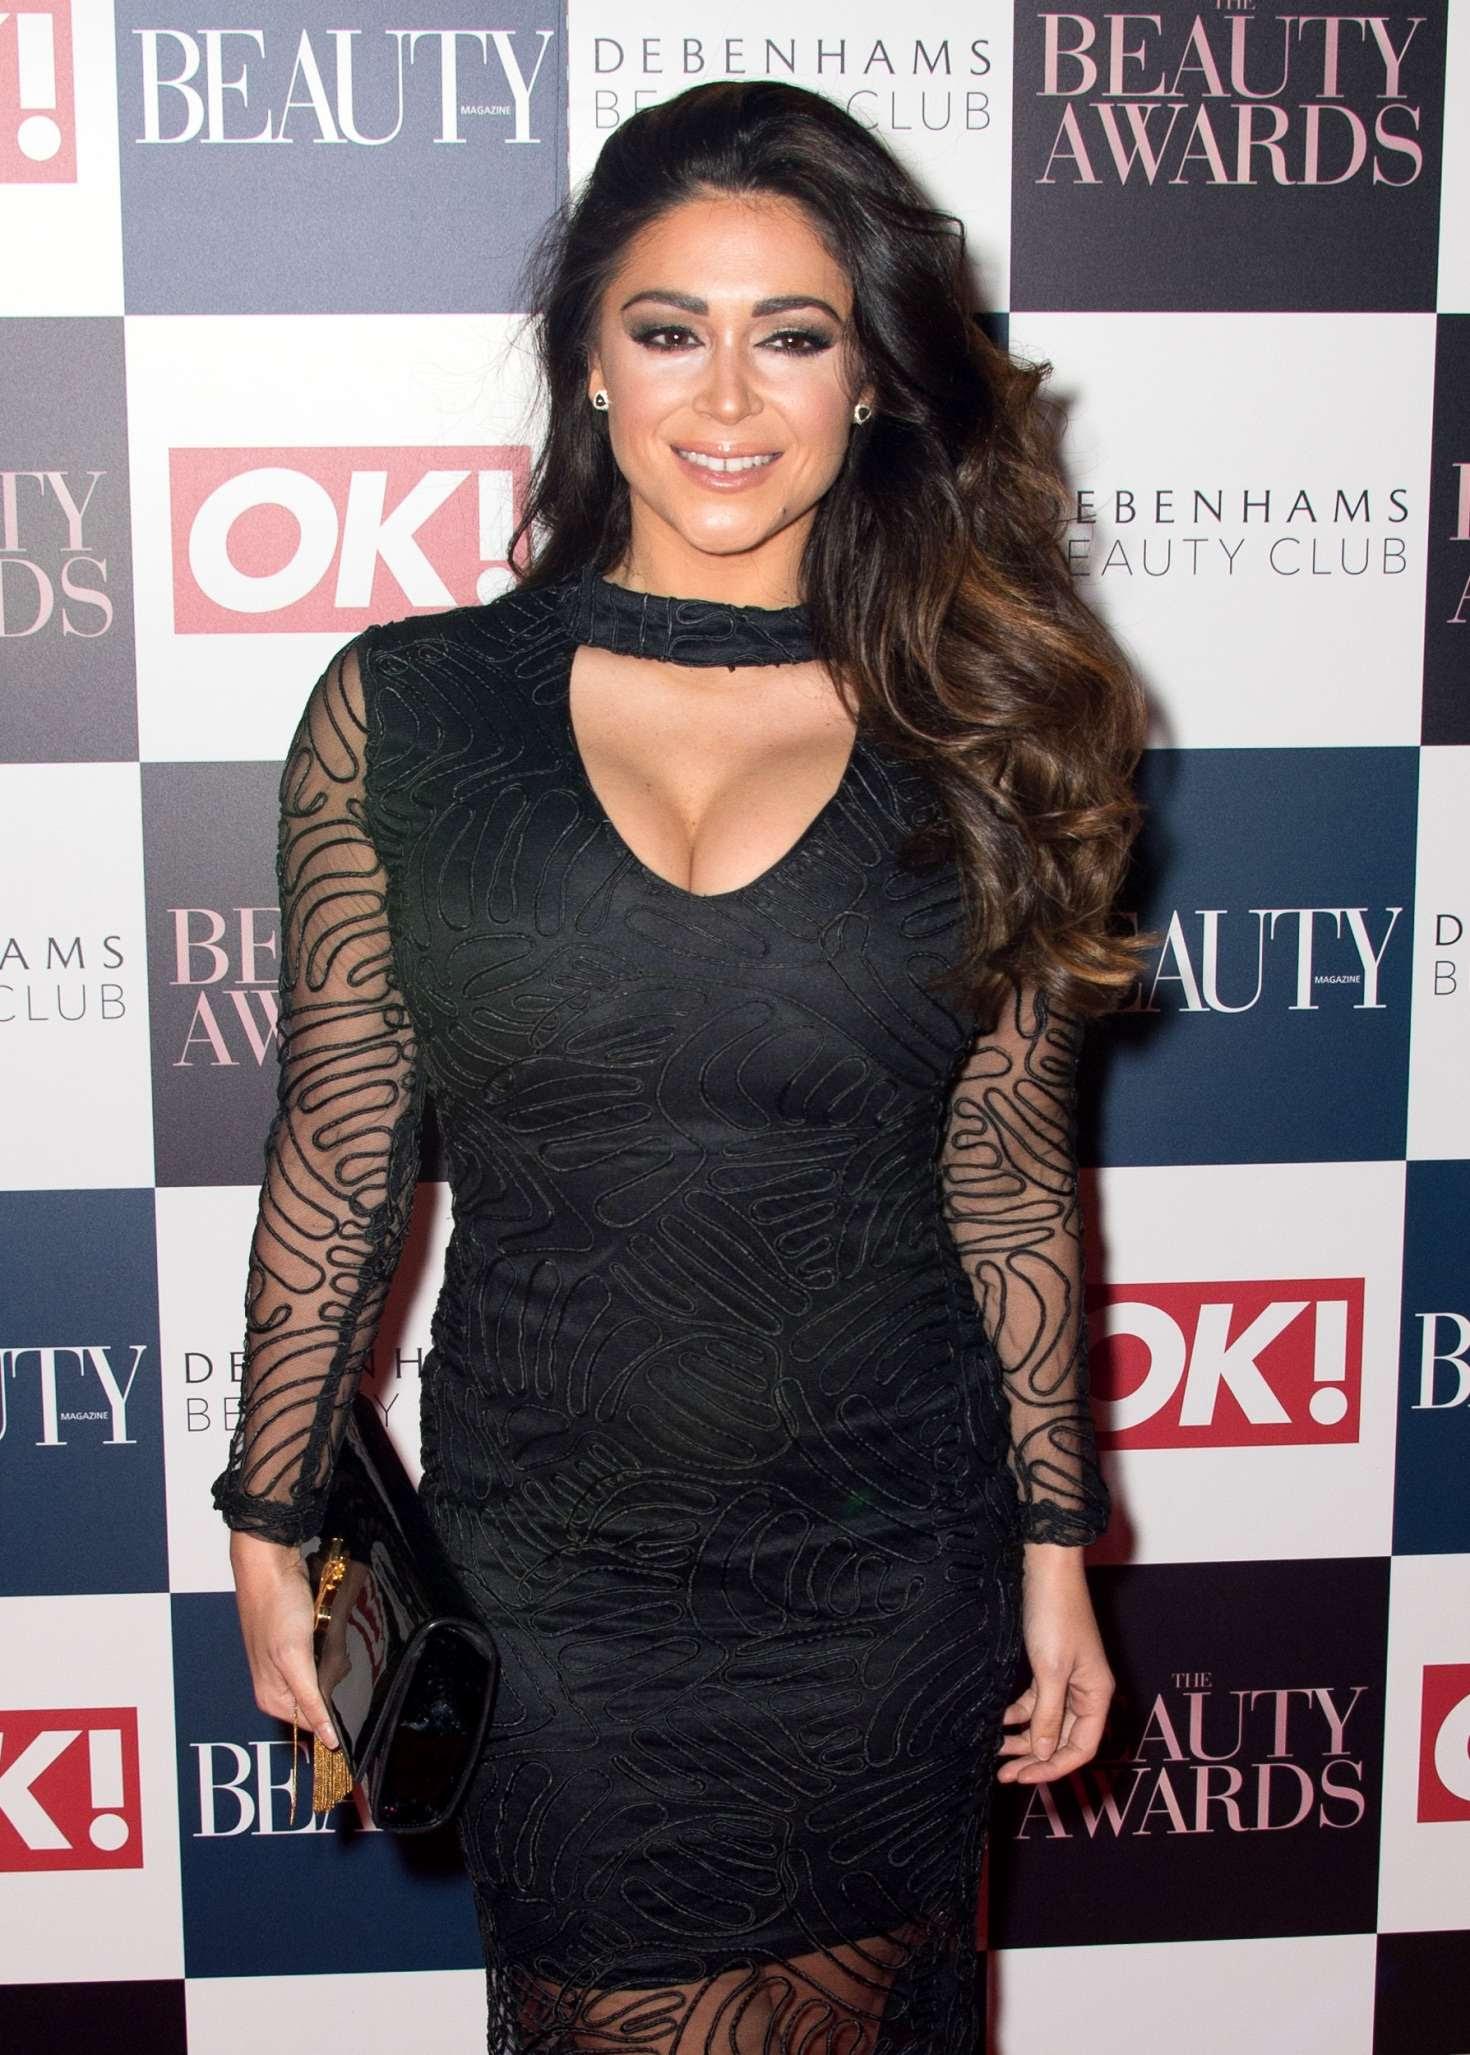 Casey Batchelor – Beauty Awards 2016 in London